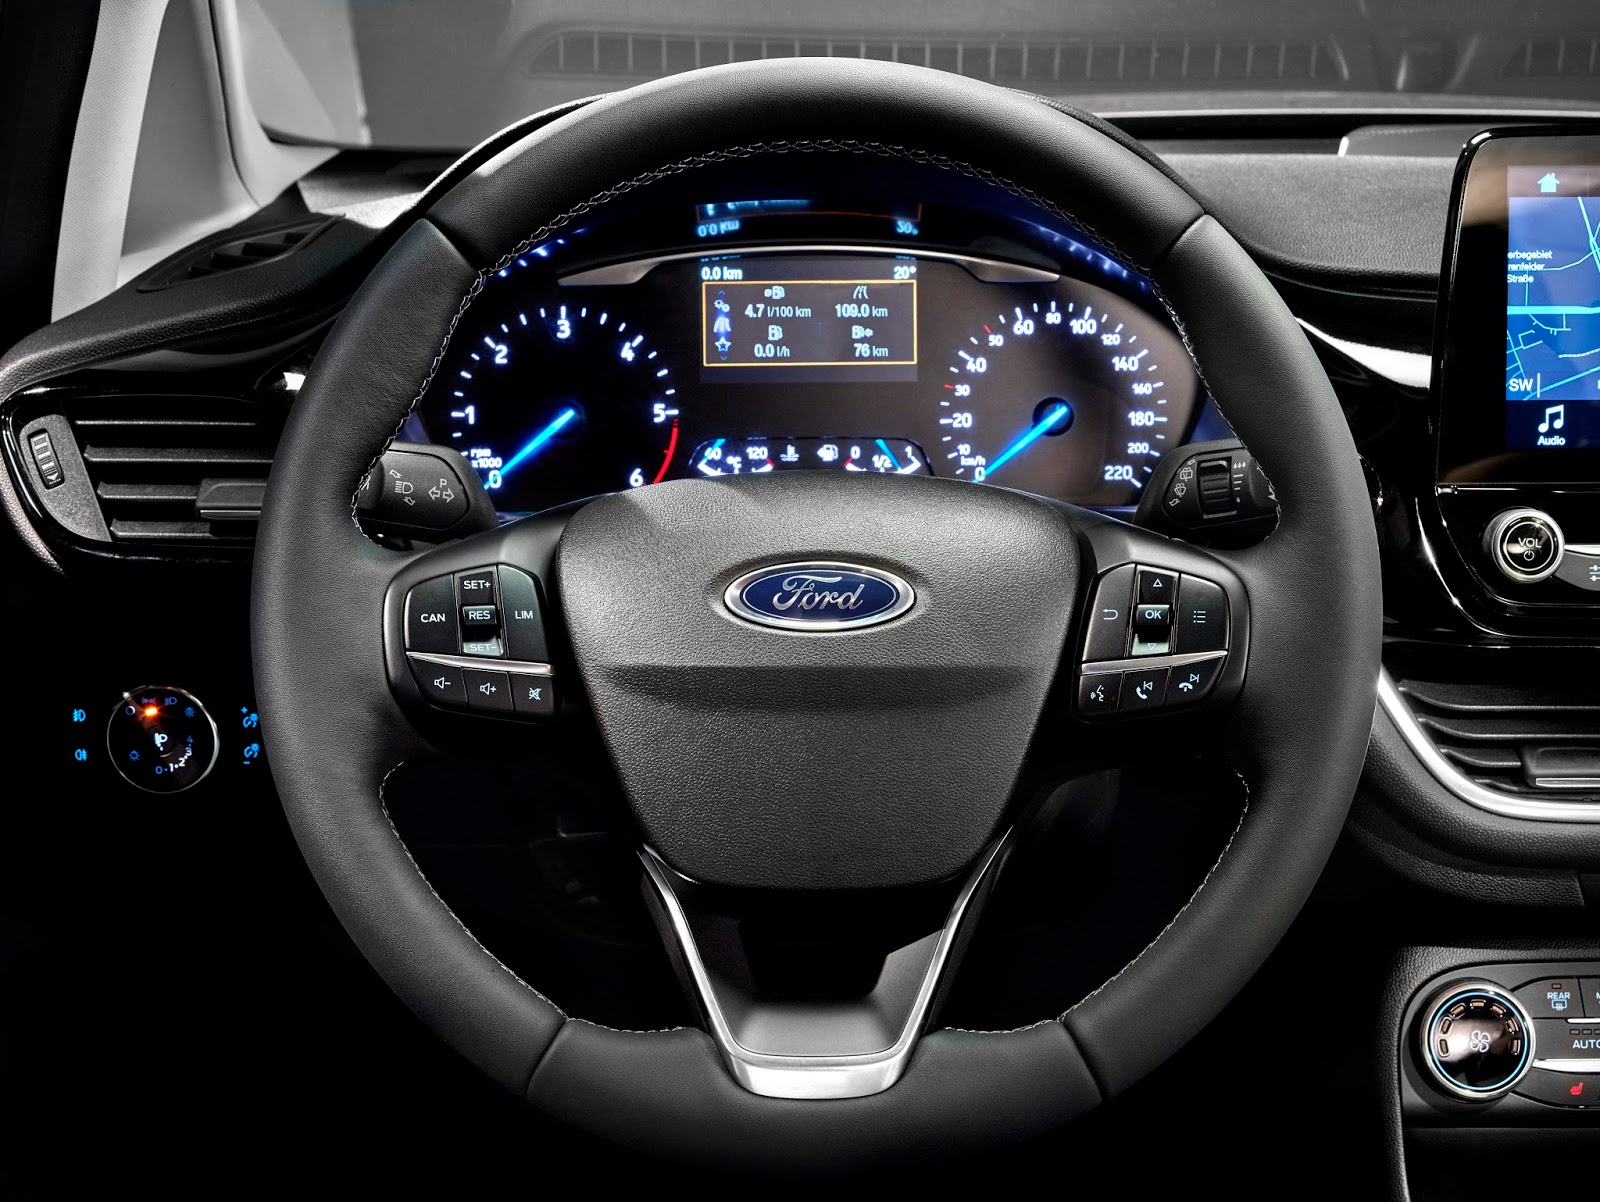 FORD FIESTA2016 TITANIUM STEERING 10 Τα πρώτα Ford Fiesta έρχονται στην Ελλάδα, με τιμή από 12.990€ Bestseller, Ford, Ford Fiesta, supermini, Λανσάρισμα